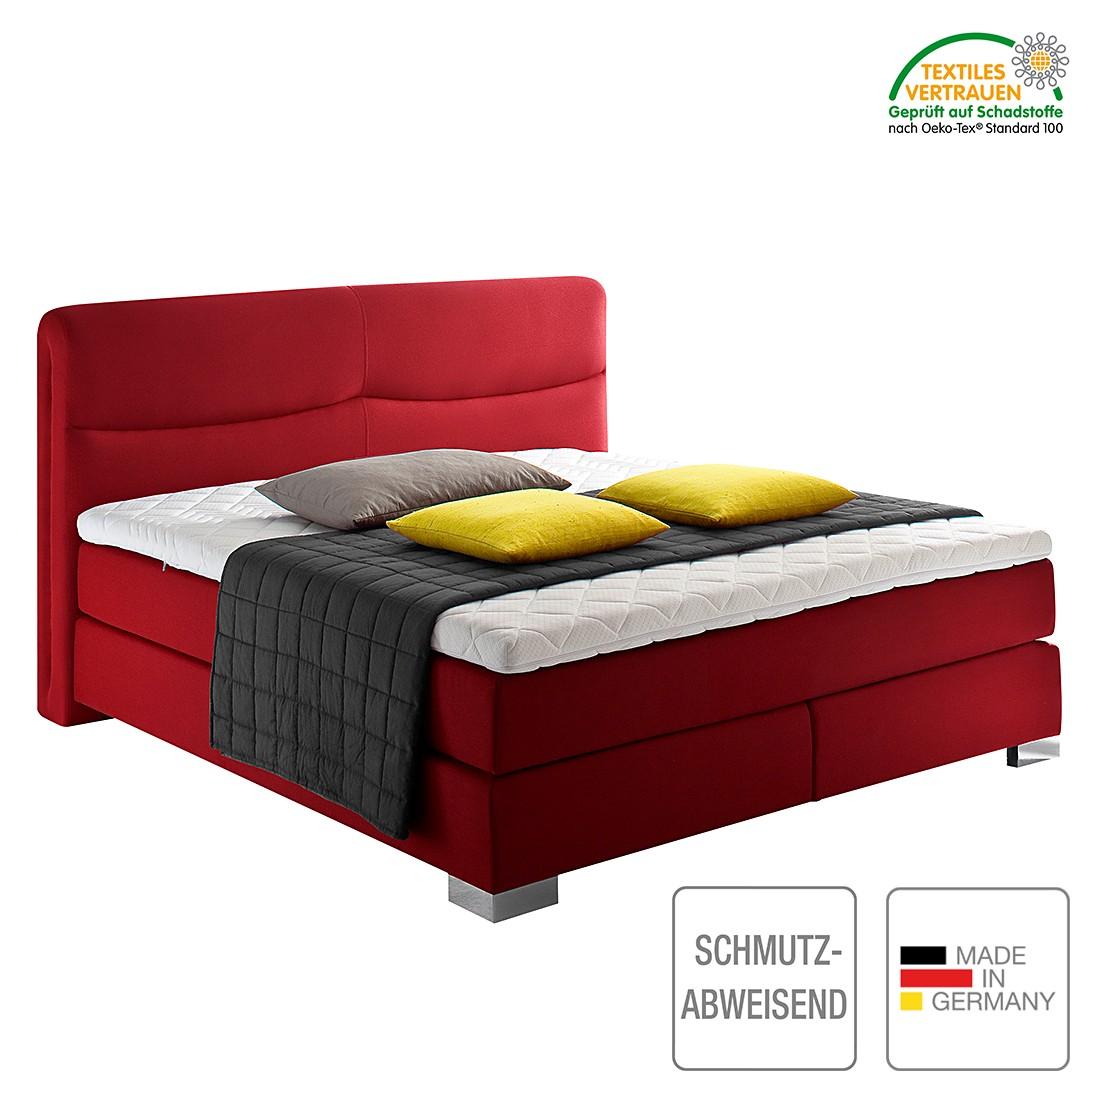 boxspringbett scala webstoff h3 ab 80 kg kaltschaumtopper bonellfederkern multi. Black Bedroom Furniture Sets. Home Design Ideas